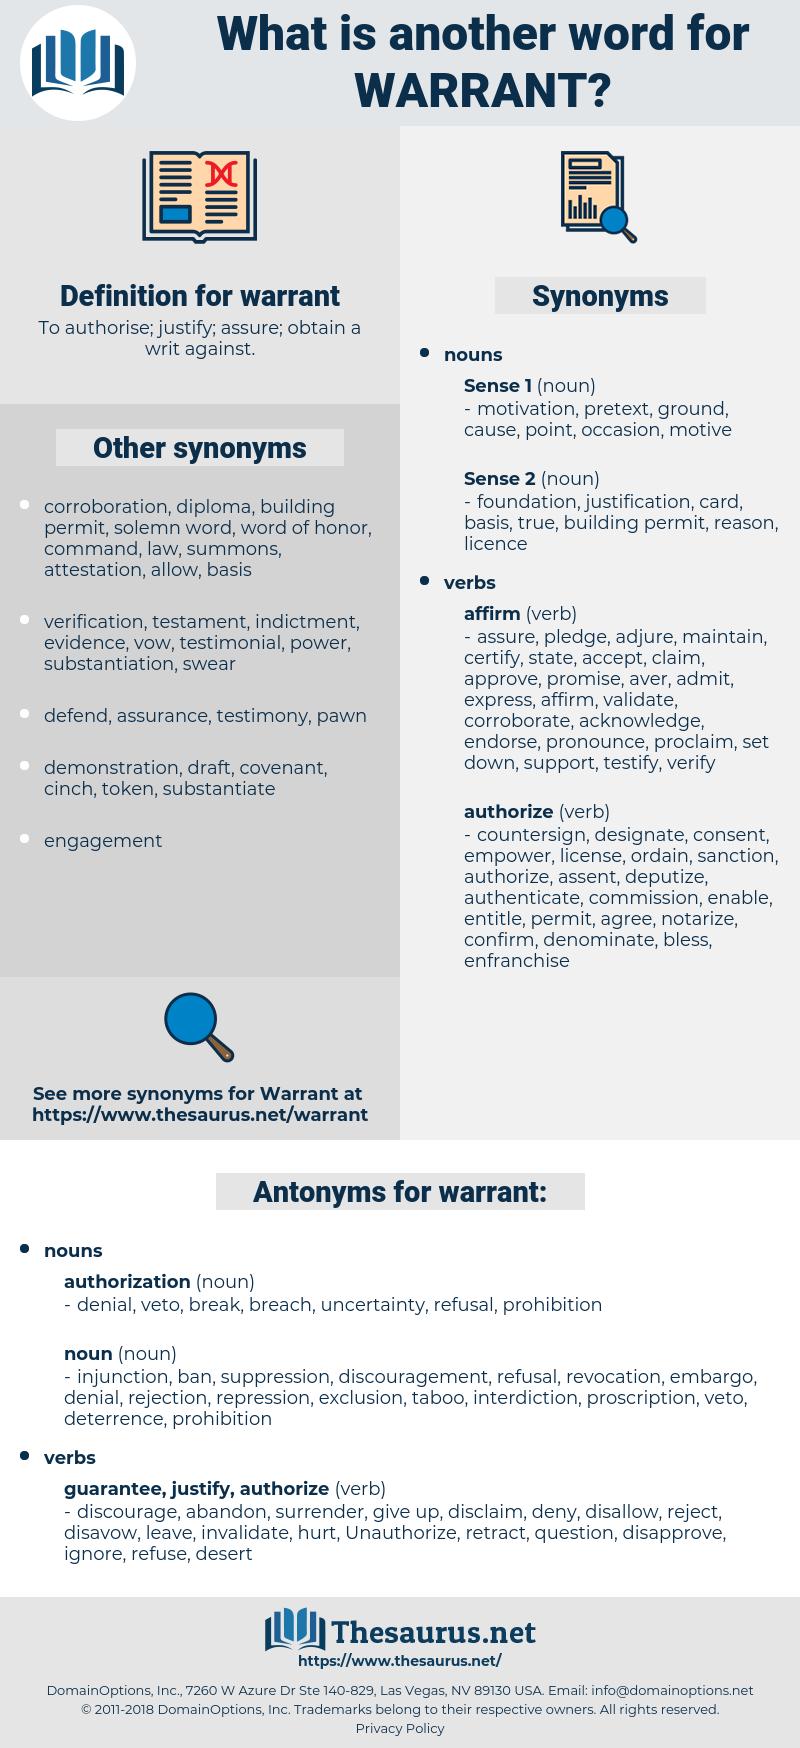 warrant, synonym warrant, another word for warrant, words like warrant, thesaurus warrant